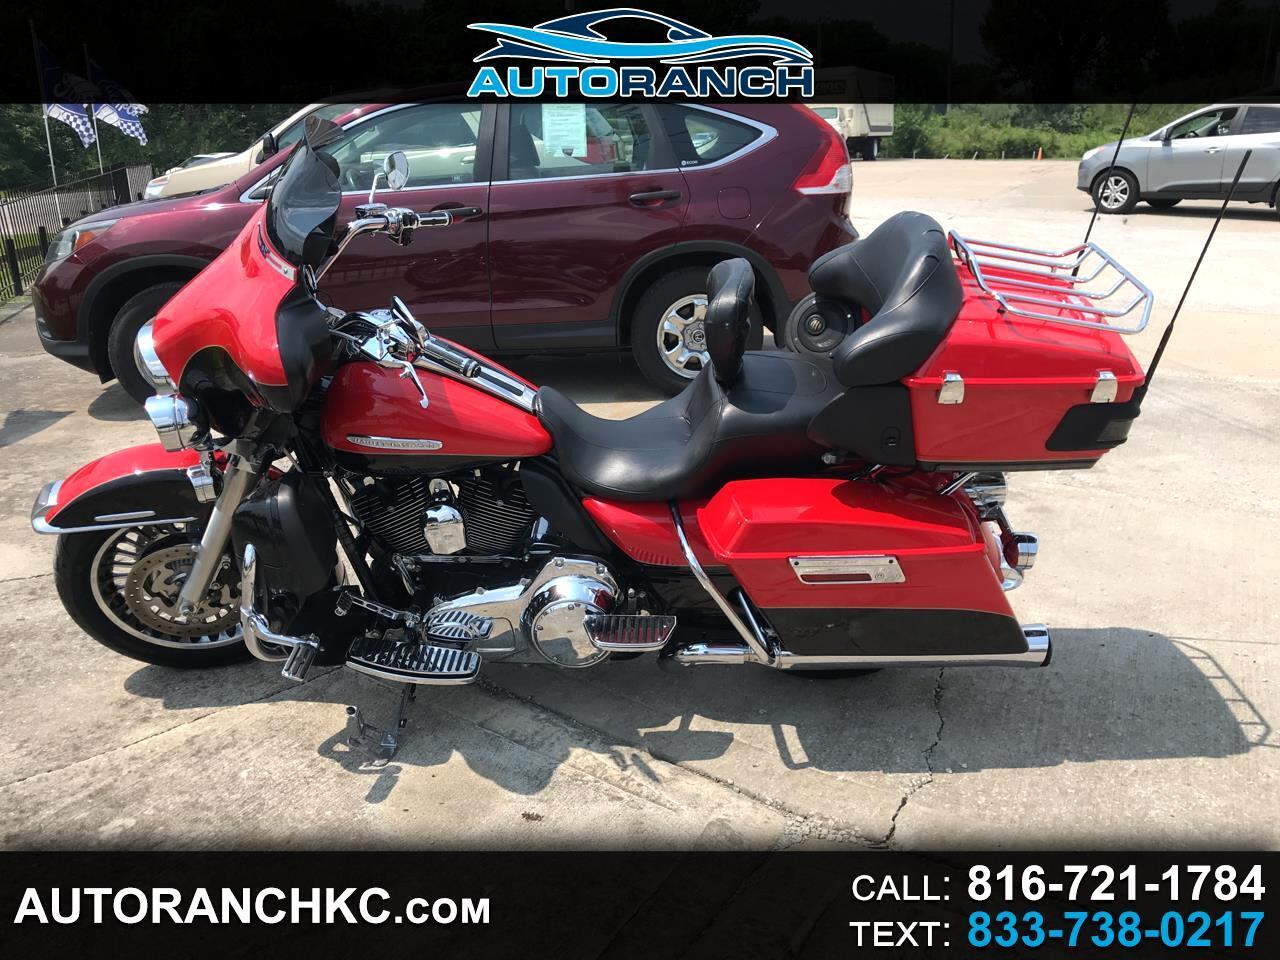 Harley-Davidson FLHTCU Ult EG Classic Ultra Classic Limited 2010